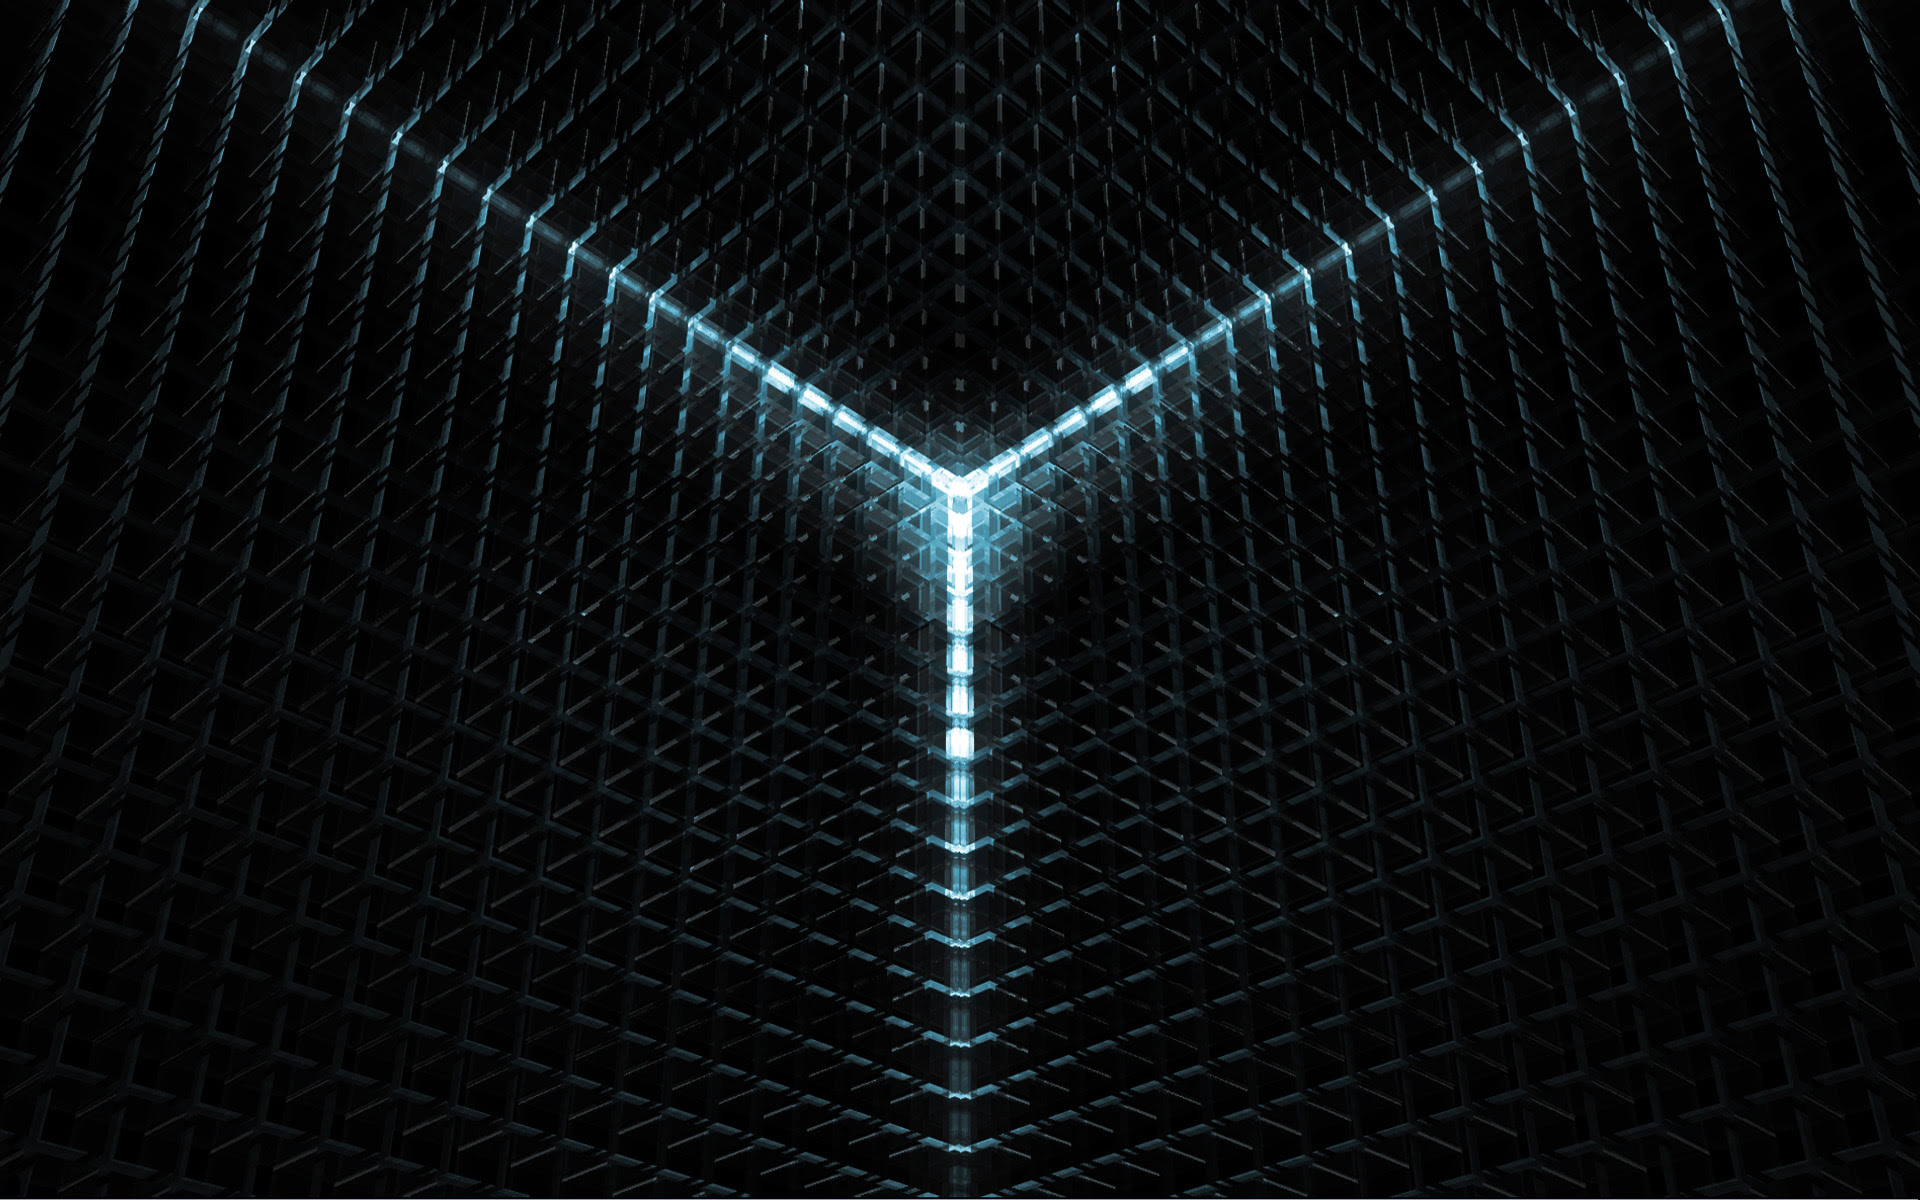 Unduh 400+ Wallpaper Abyss Original  Gratis